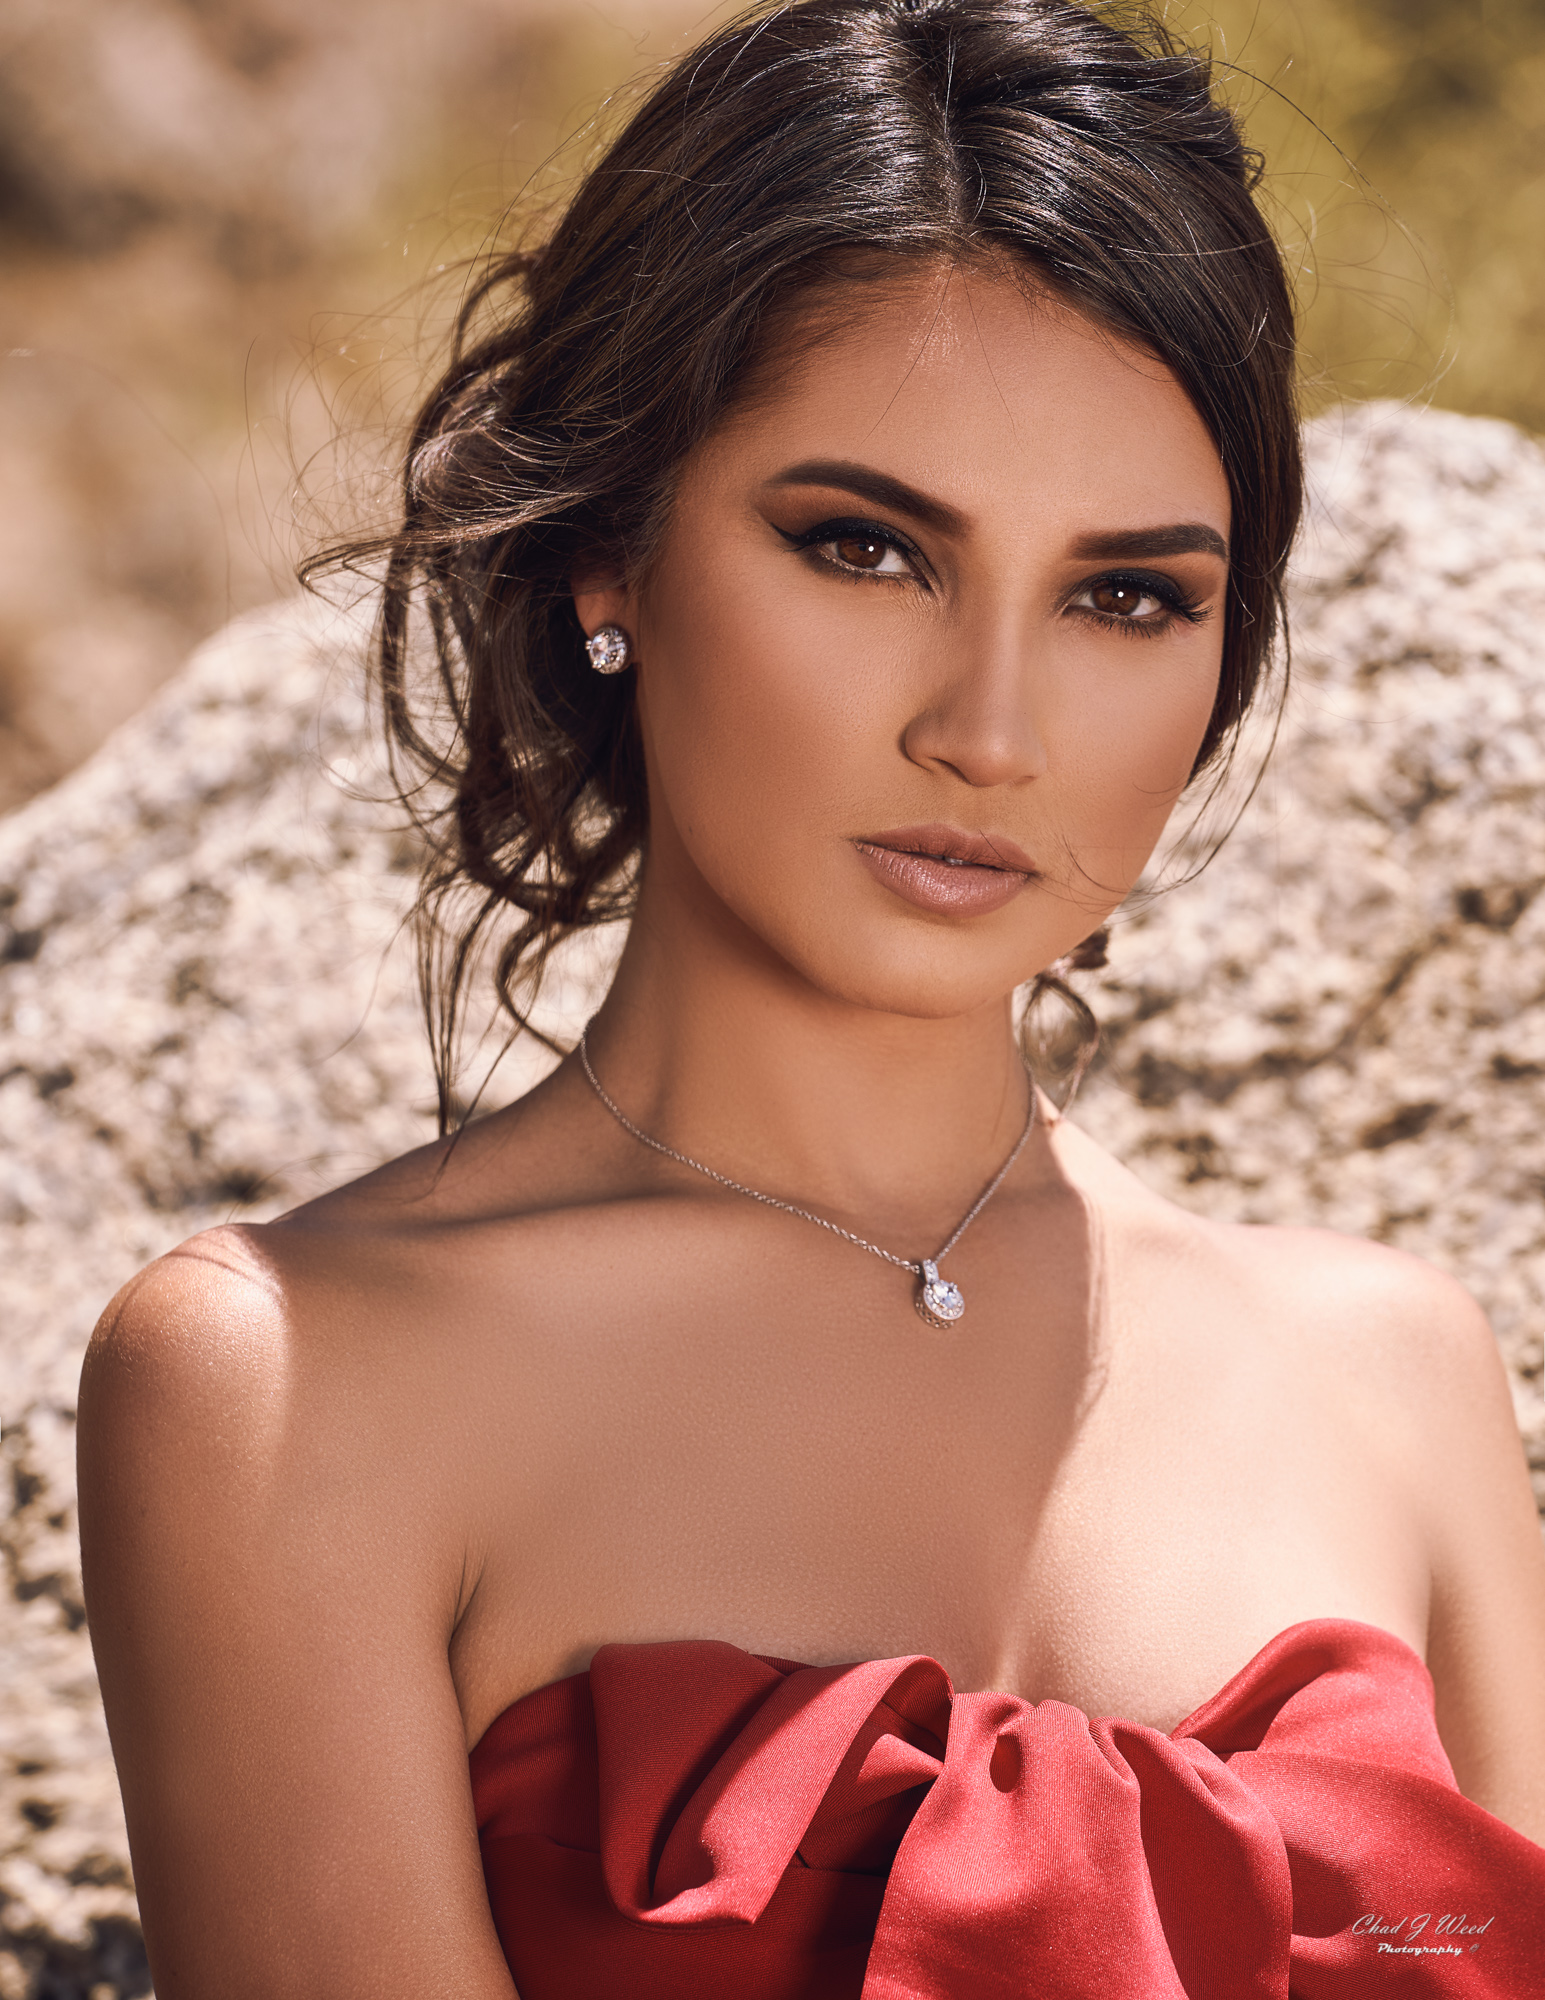 Zari Glamour Model by Mesa Arizona Glamour Photographer Chad Weed